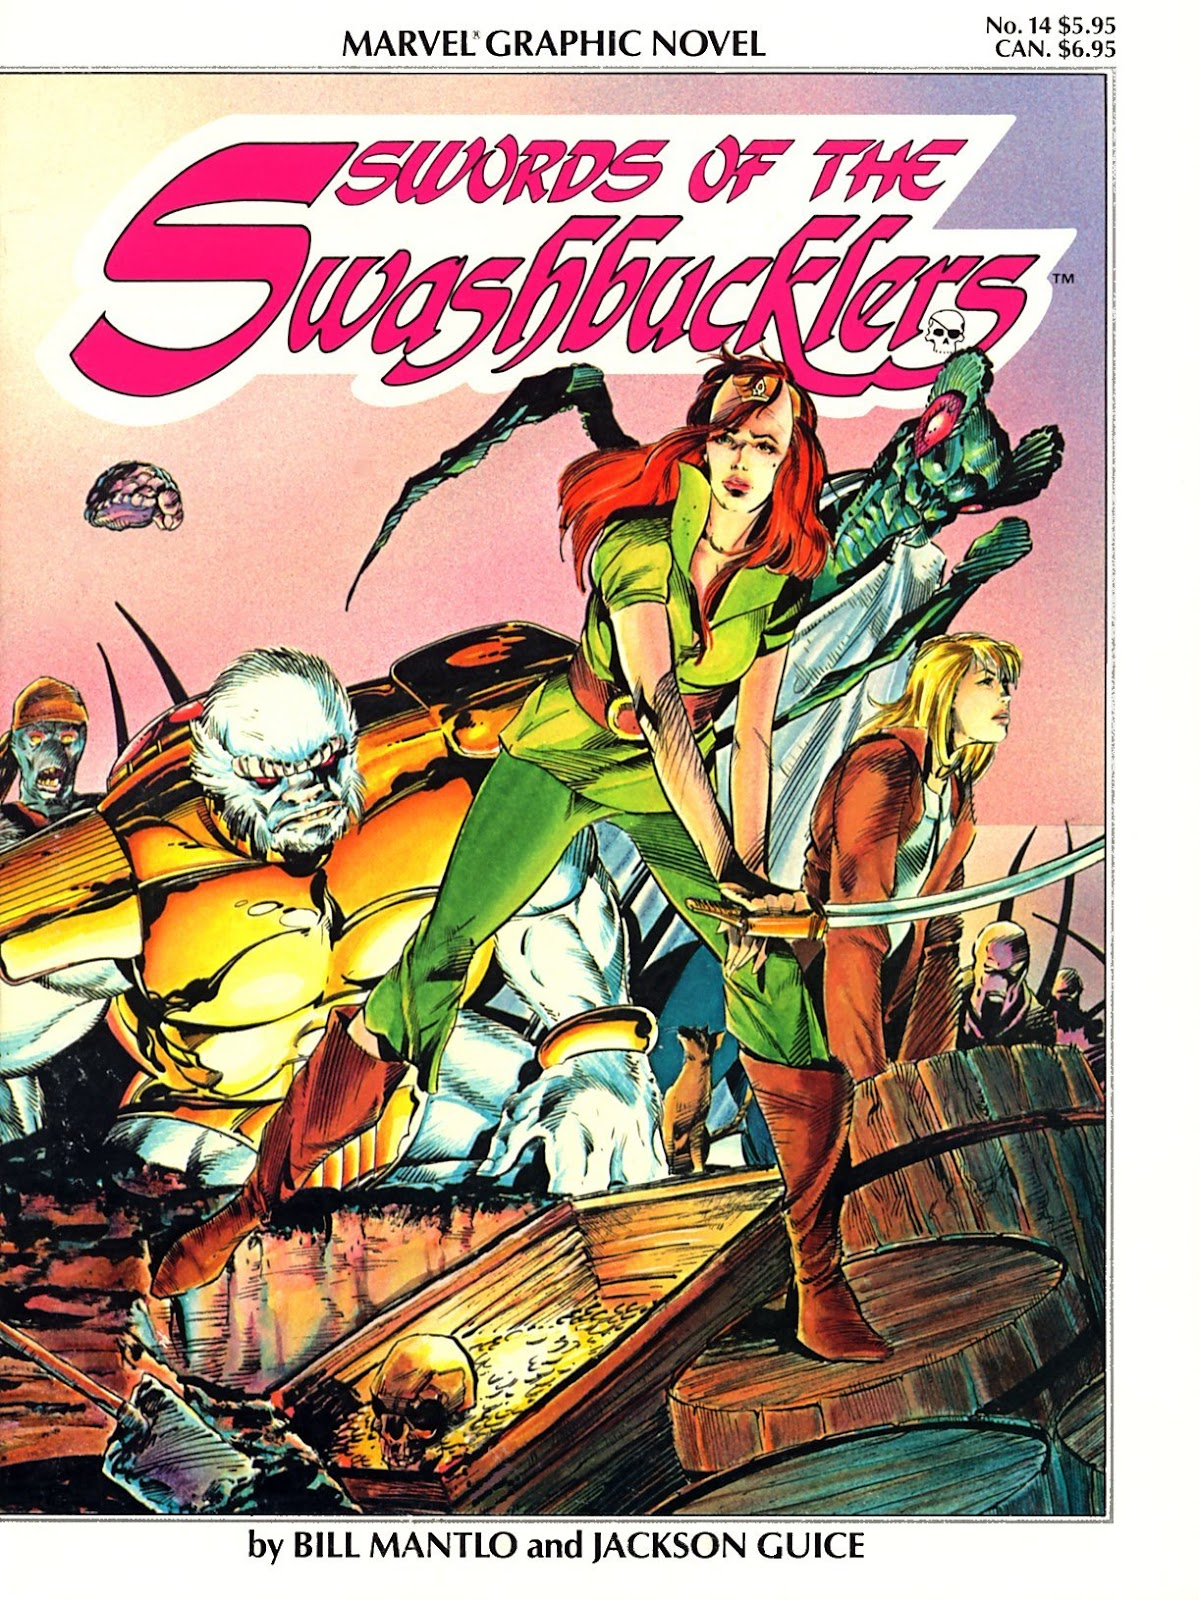 Marvel Graphic Novel 14_-_Swords_of_the_Swashbucklers Page 1